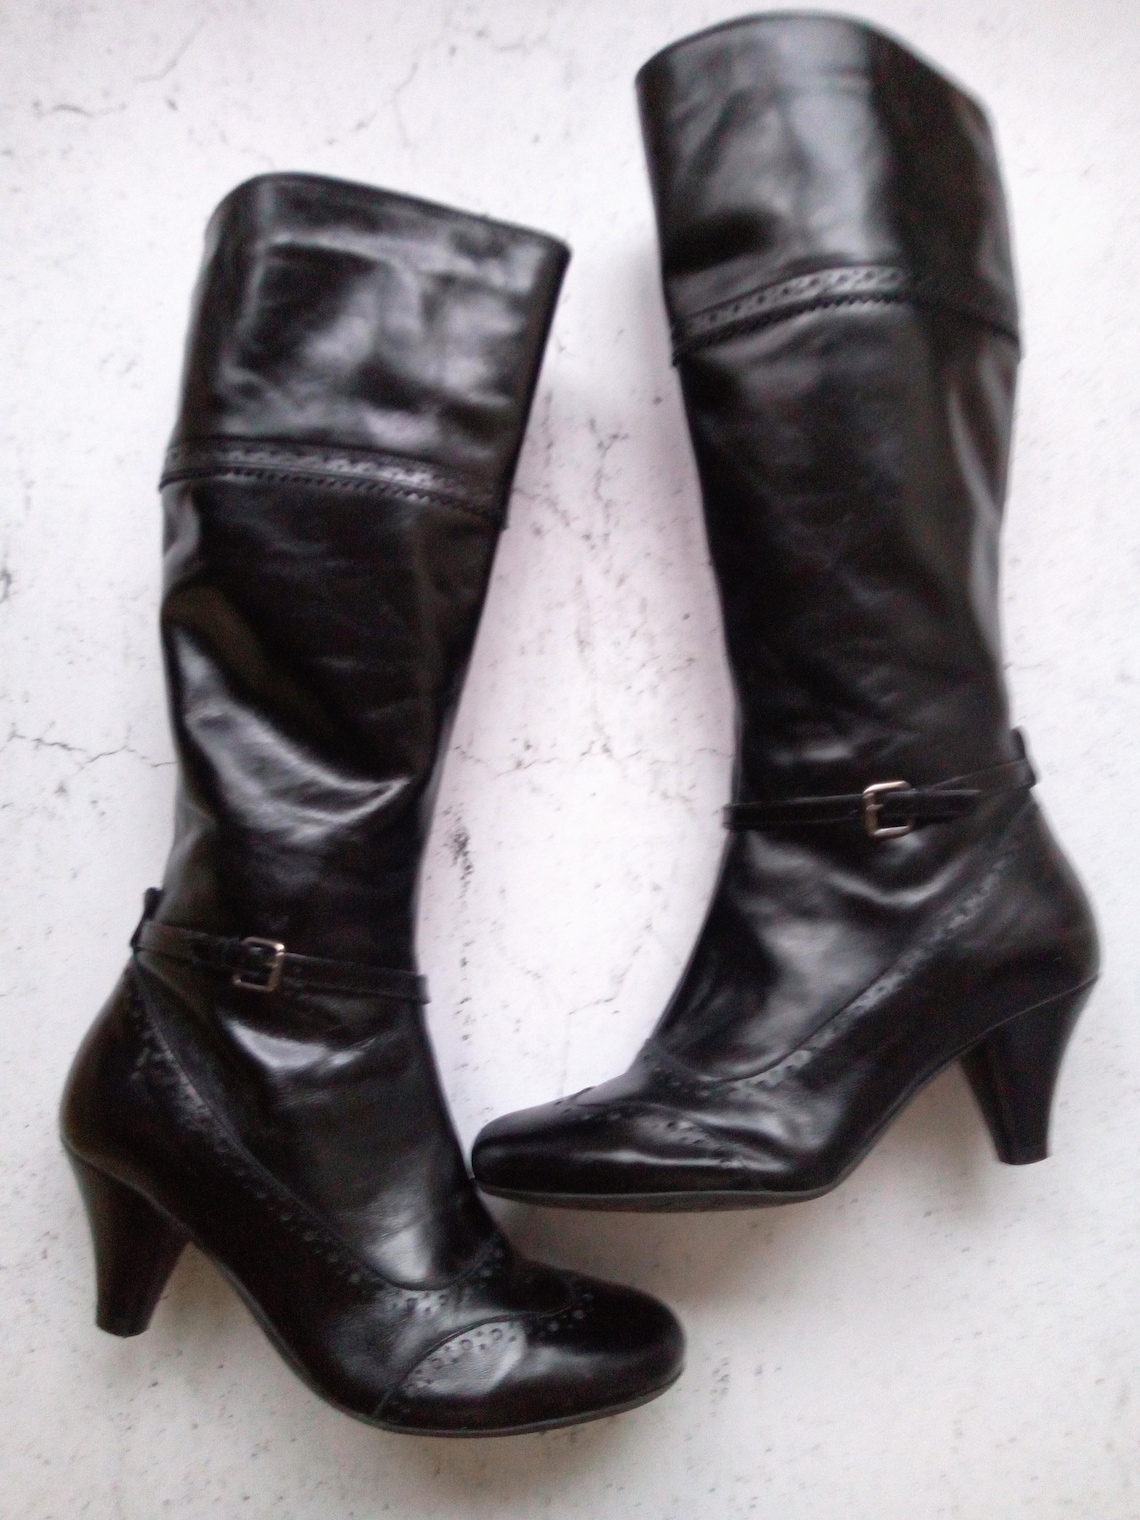 Vintage Botas Negras Altas, Zapatos de punta de ala negra, Botas redondas, EUR 37, UK 4, US 6,5